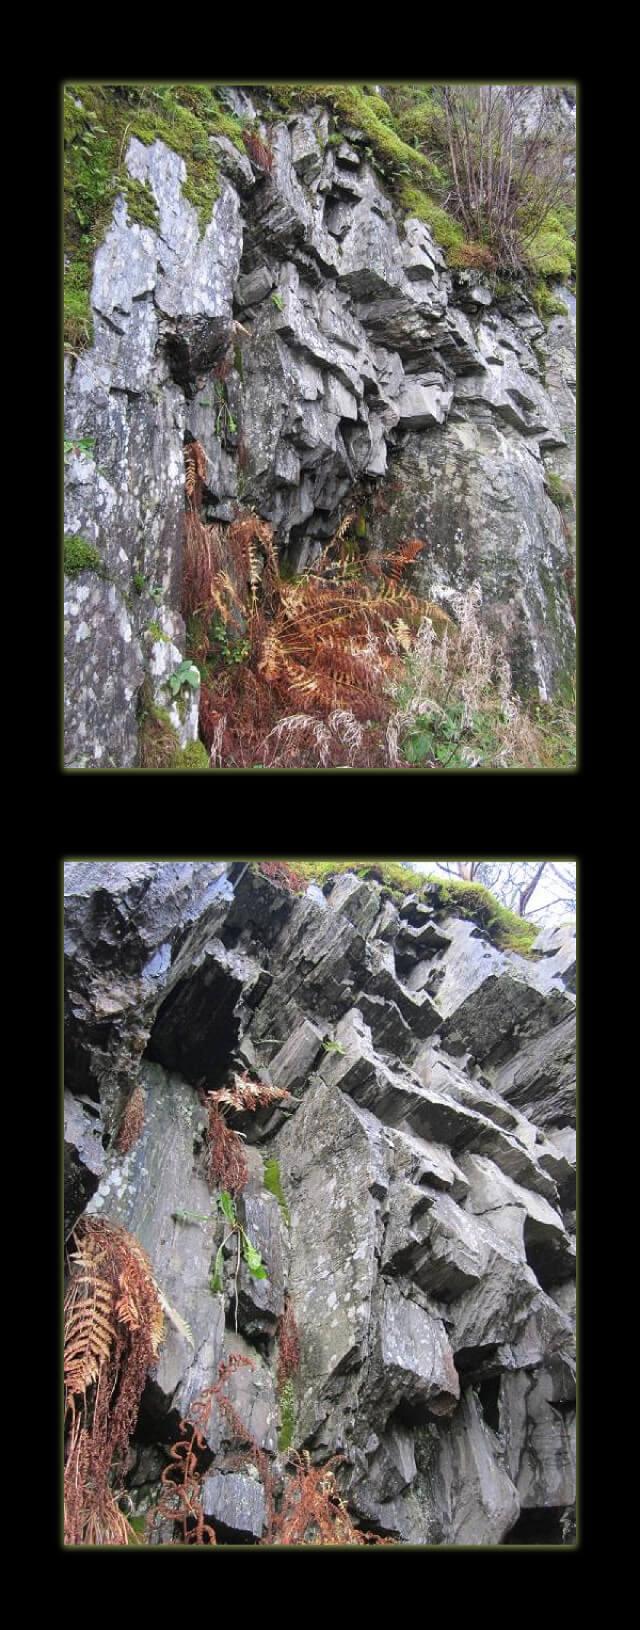 Wordless Wednesday - geometric rocks